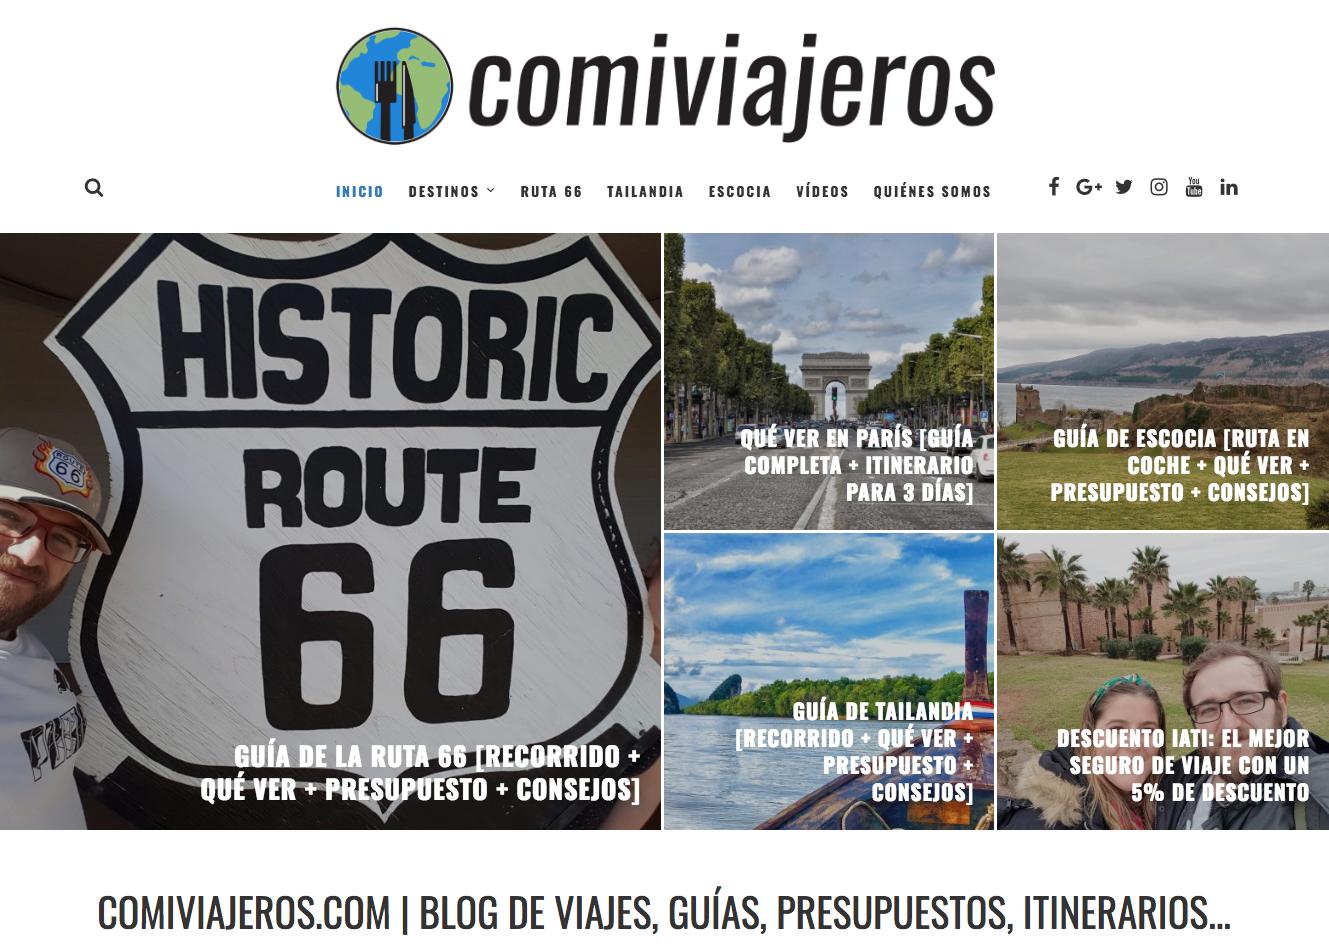 CHUSAYinka TravelBlog: Blogs que inspiran: COMIVIAJEROS